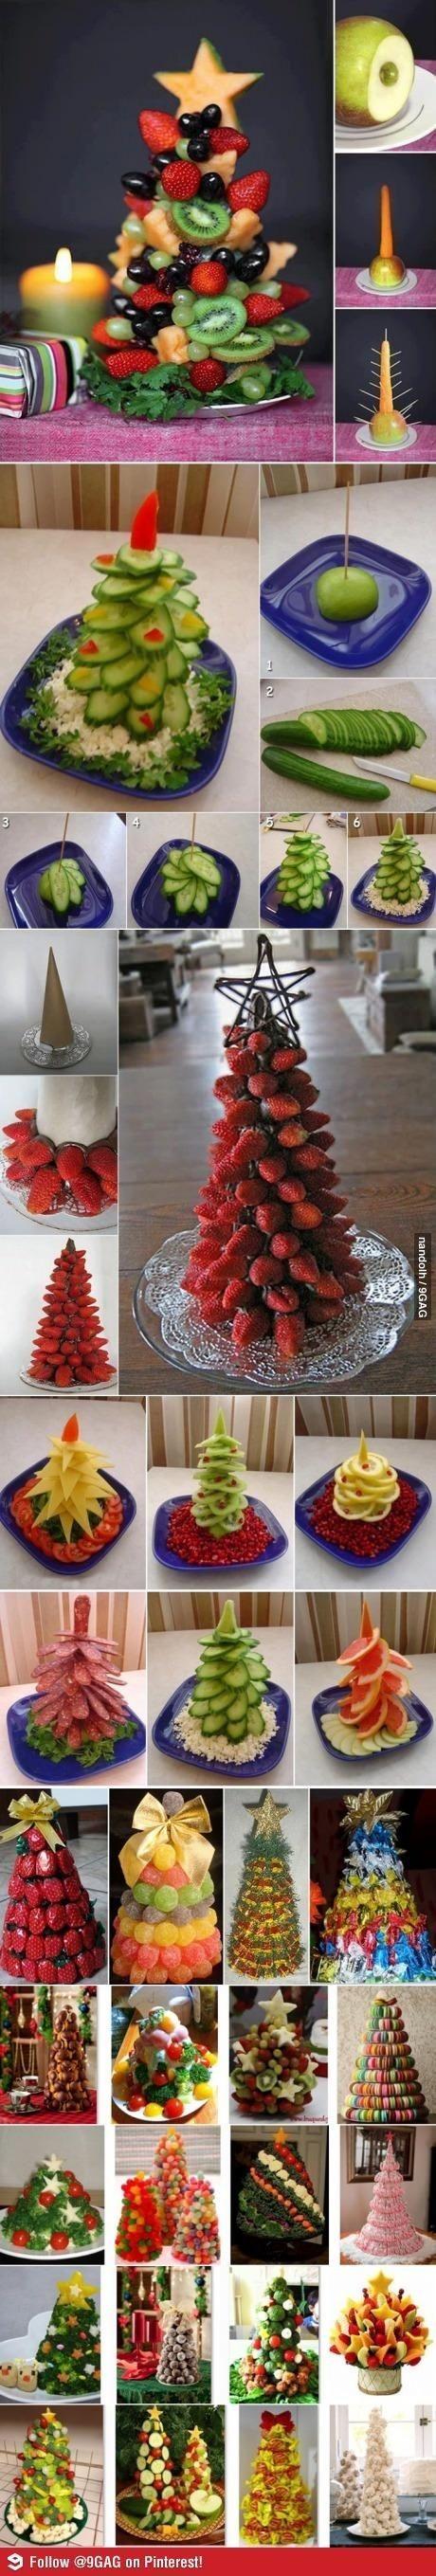 edible tree ideas #appetizer #Christmas